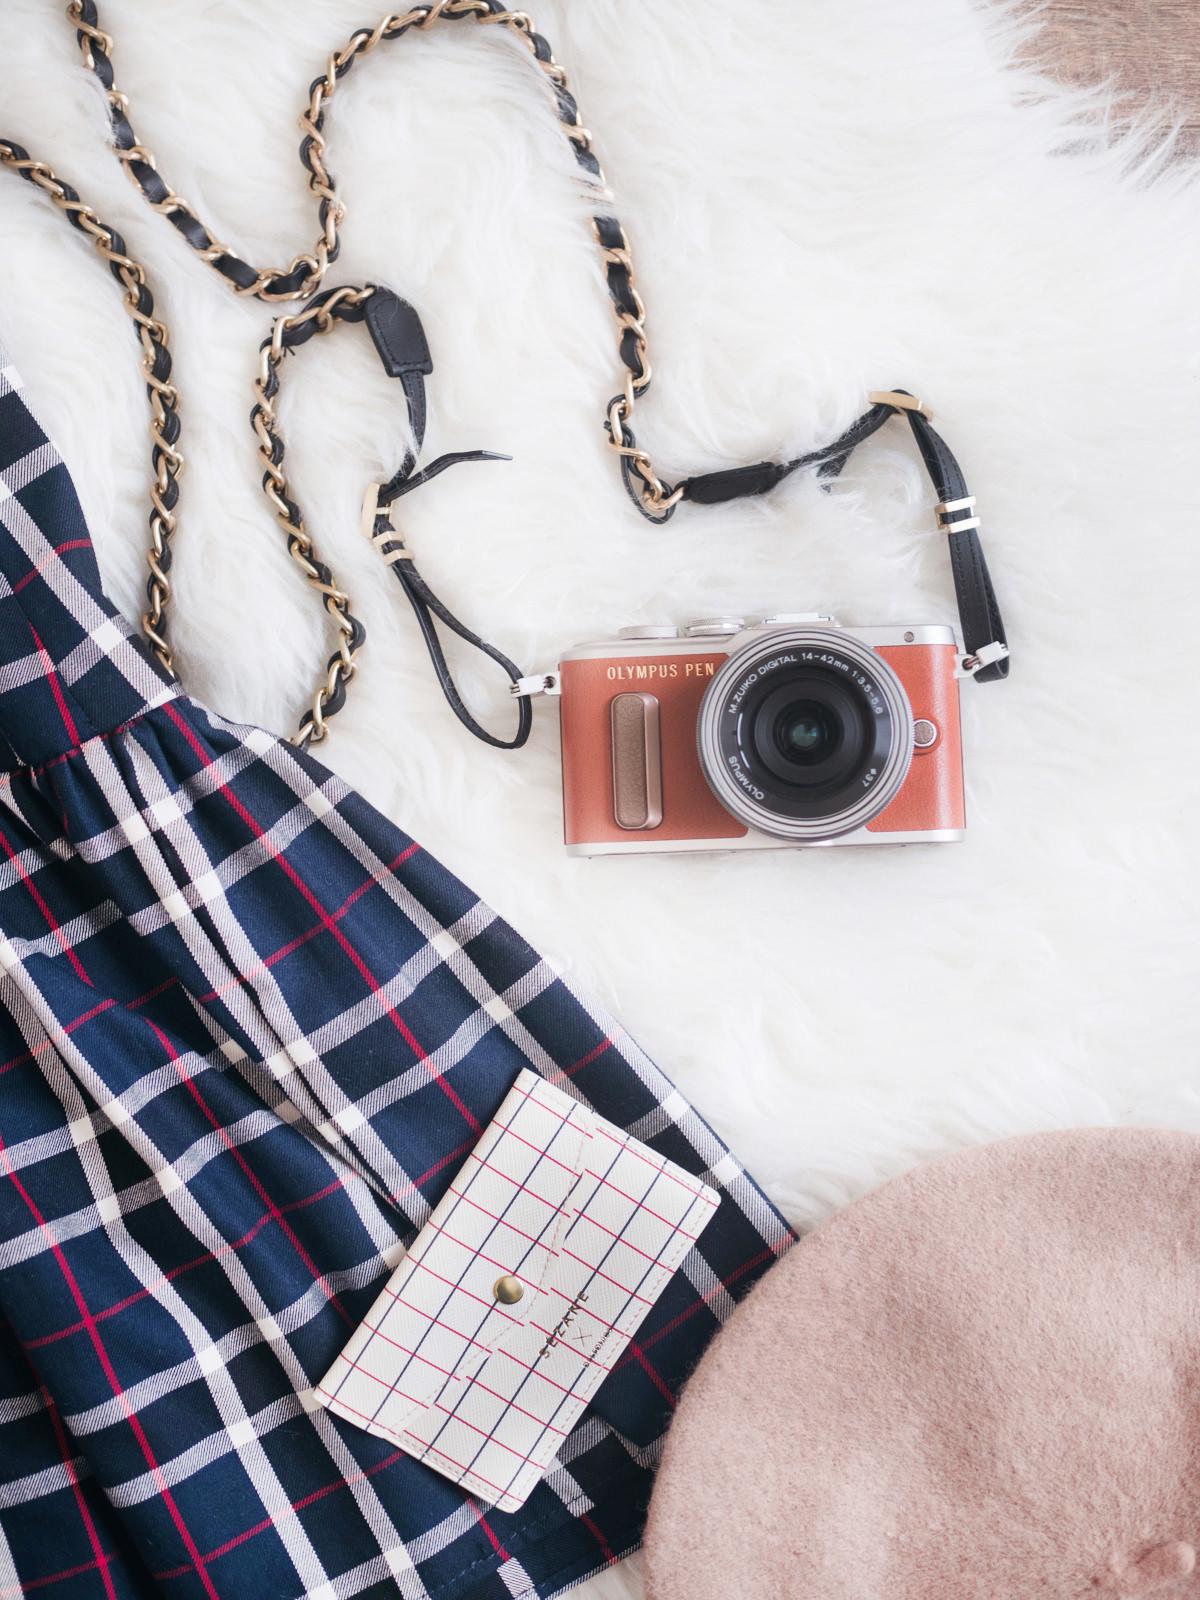 Blog-Mode-And-The-City-Lifestyle-Avis-Olympys-EPL8-appareil-photo-hybride21-1